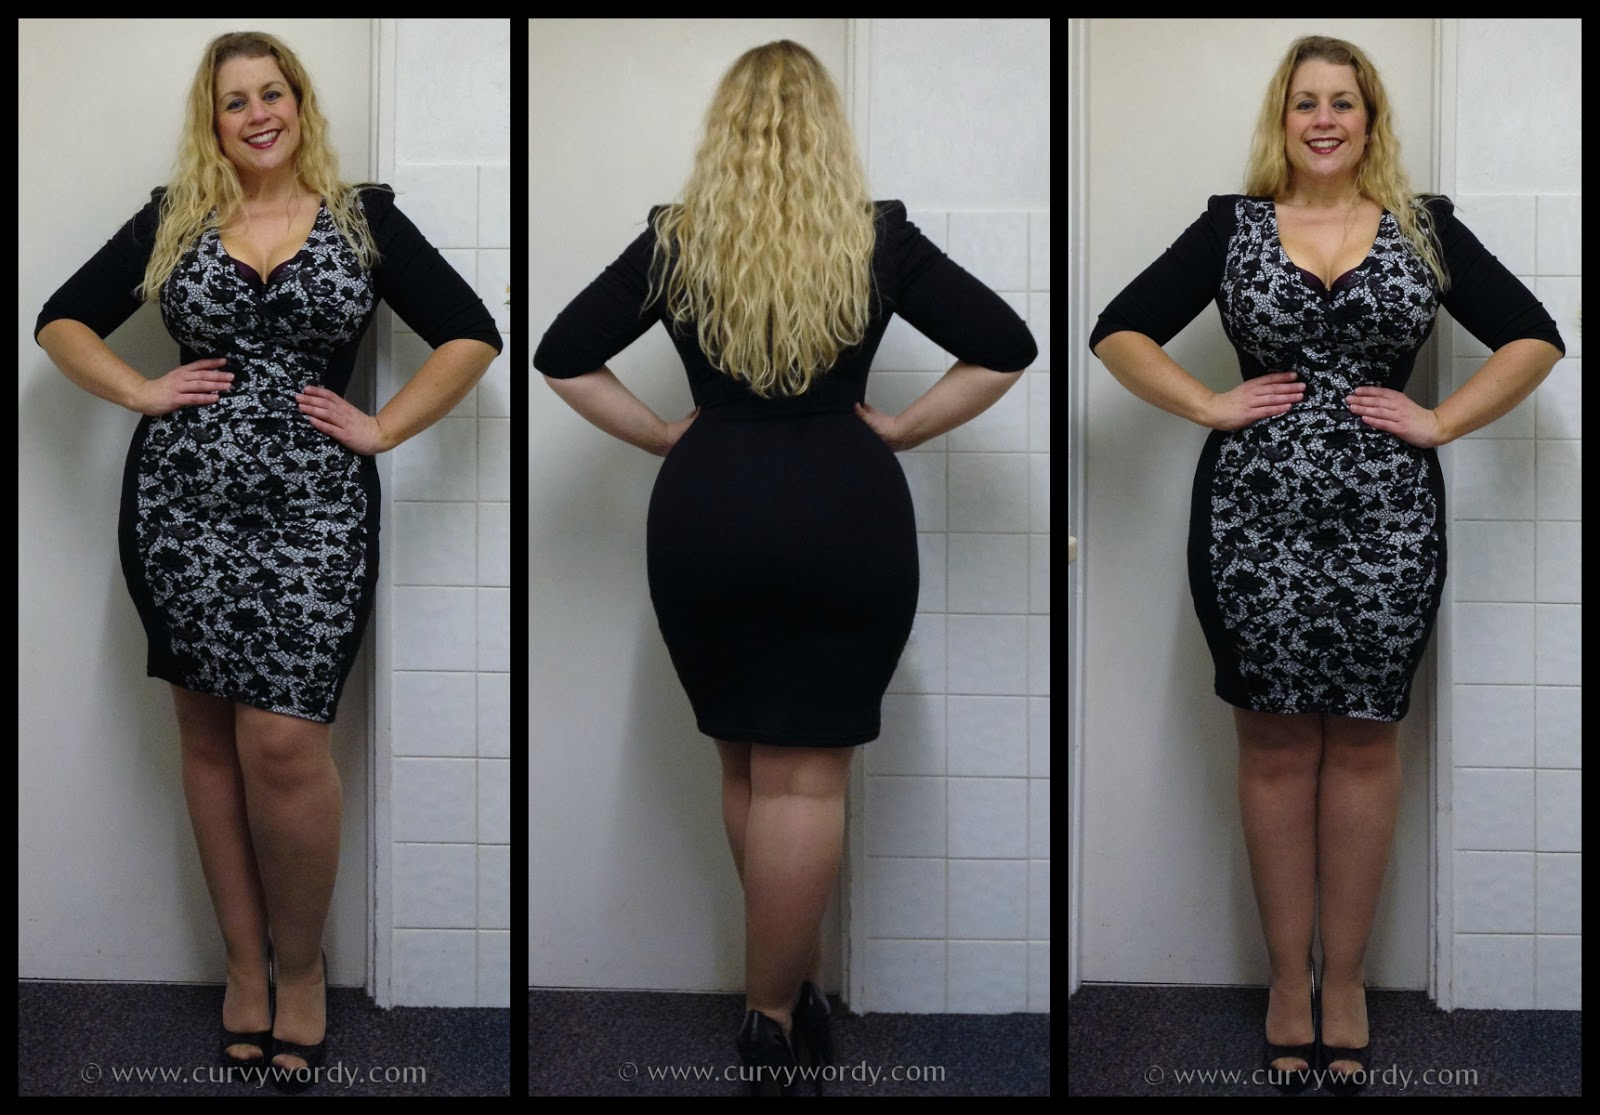 F F Clothing At Tesco Julia Plus Size Lace Panel Illusion Dress 18 Curvy Wordy